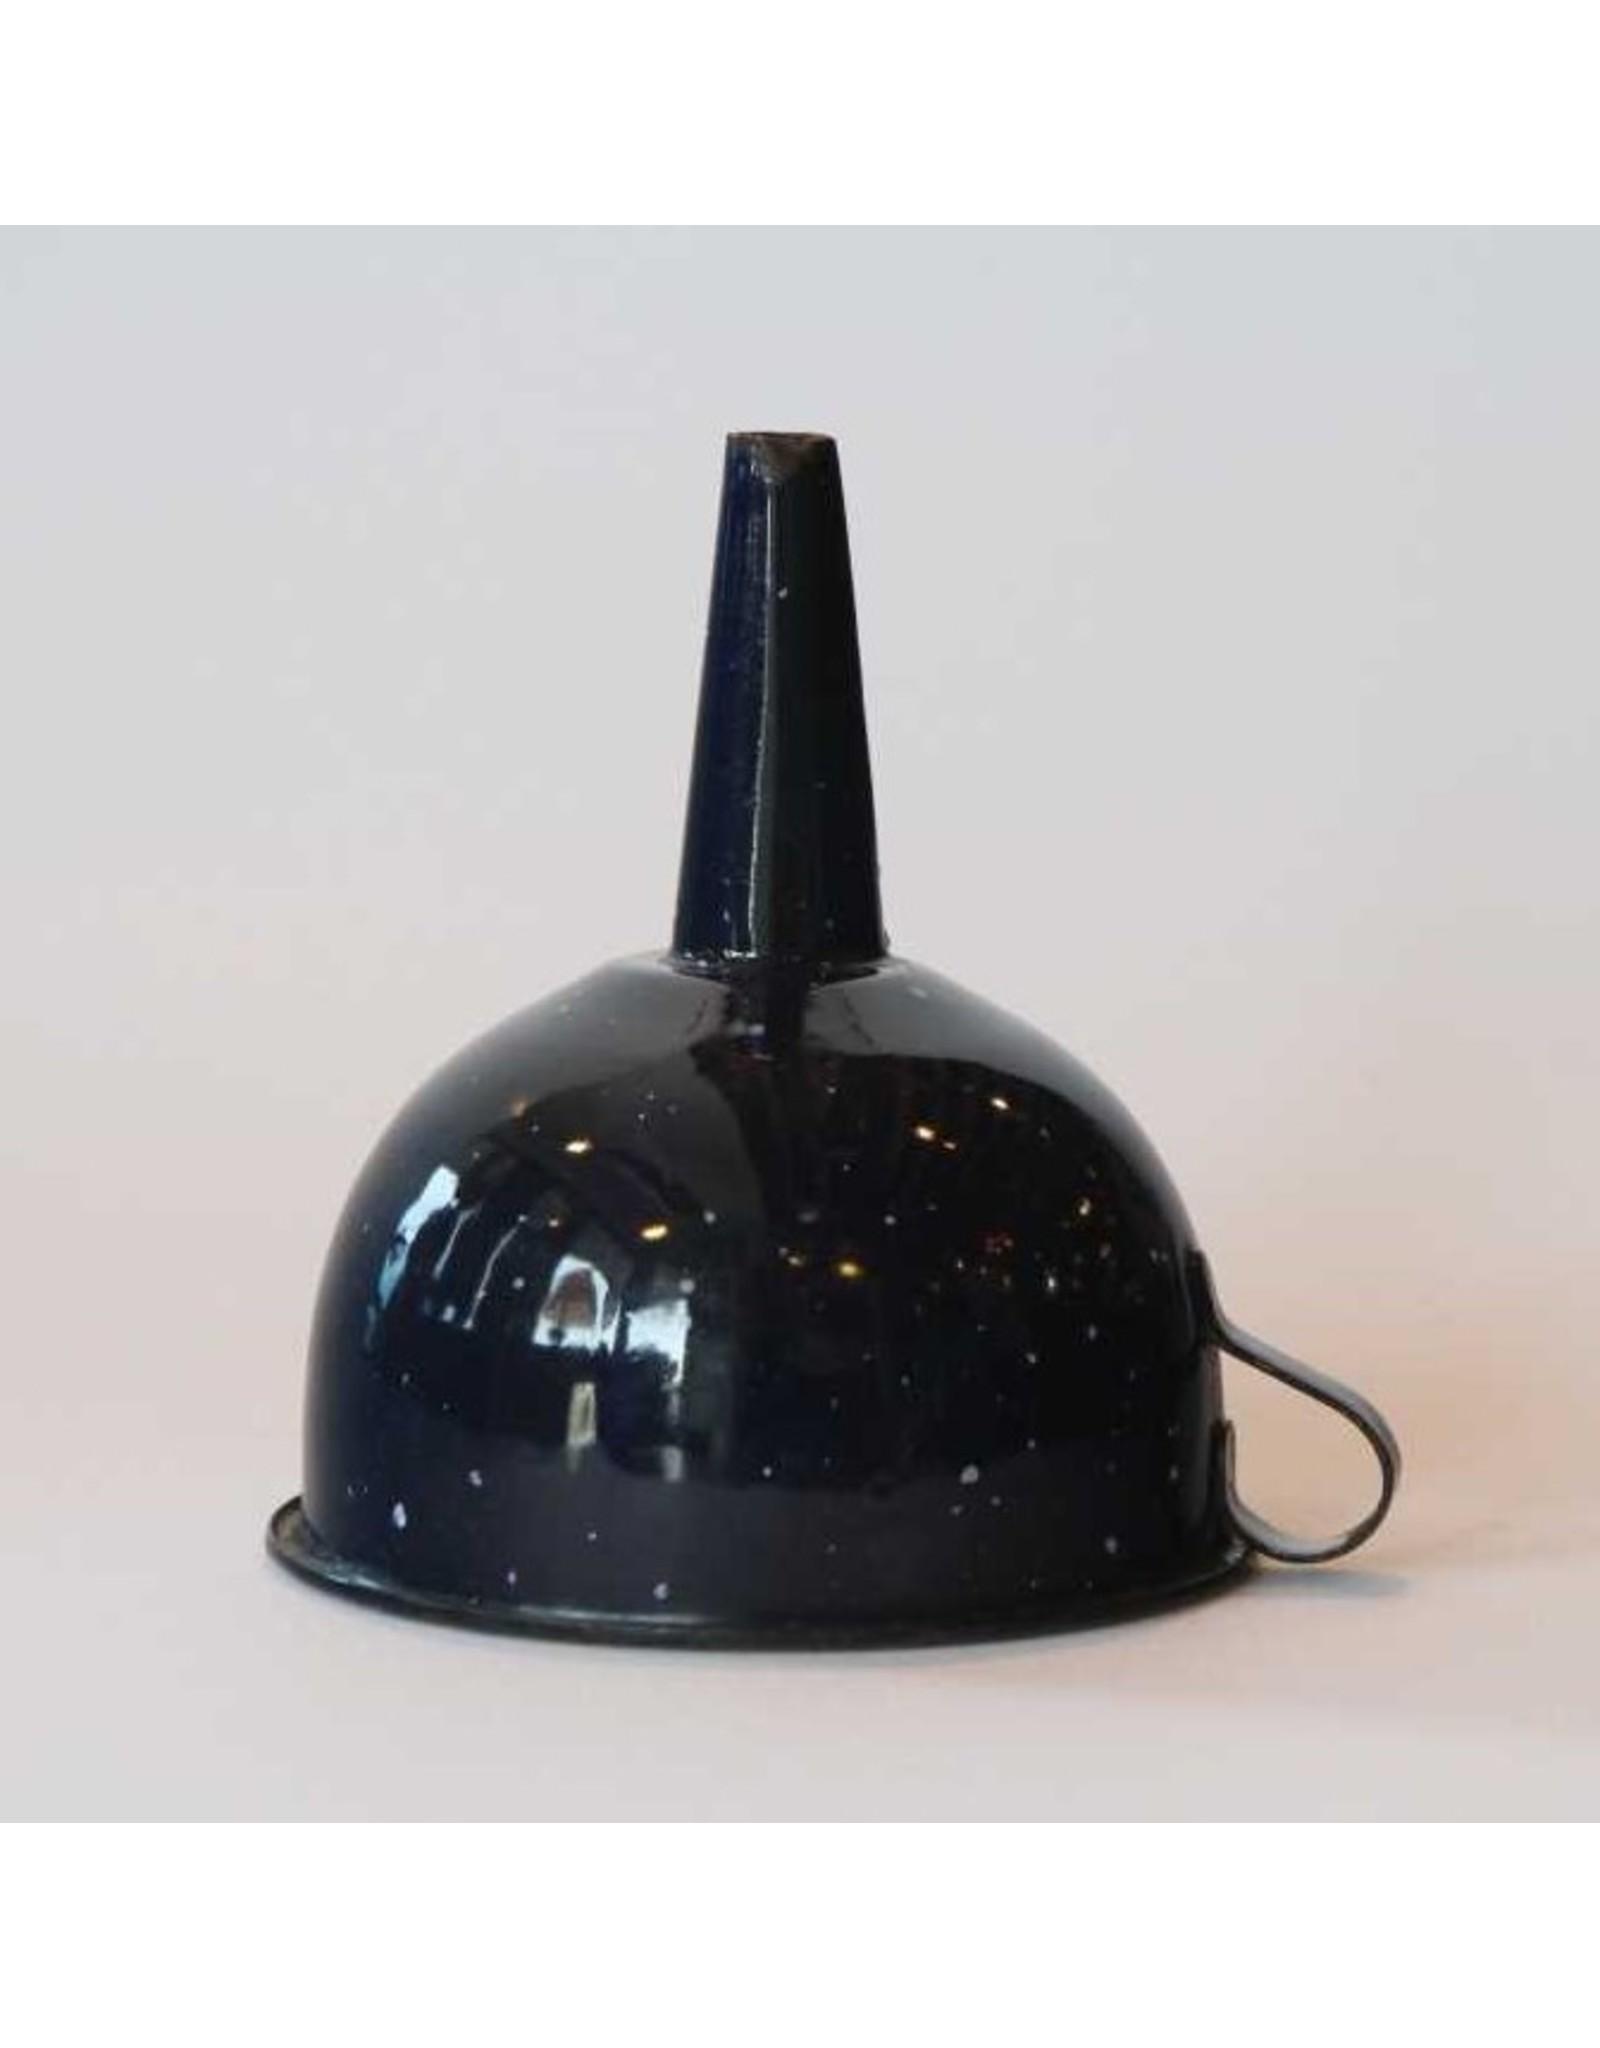 Funnel - dark blue graniteware, rustic, chippy